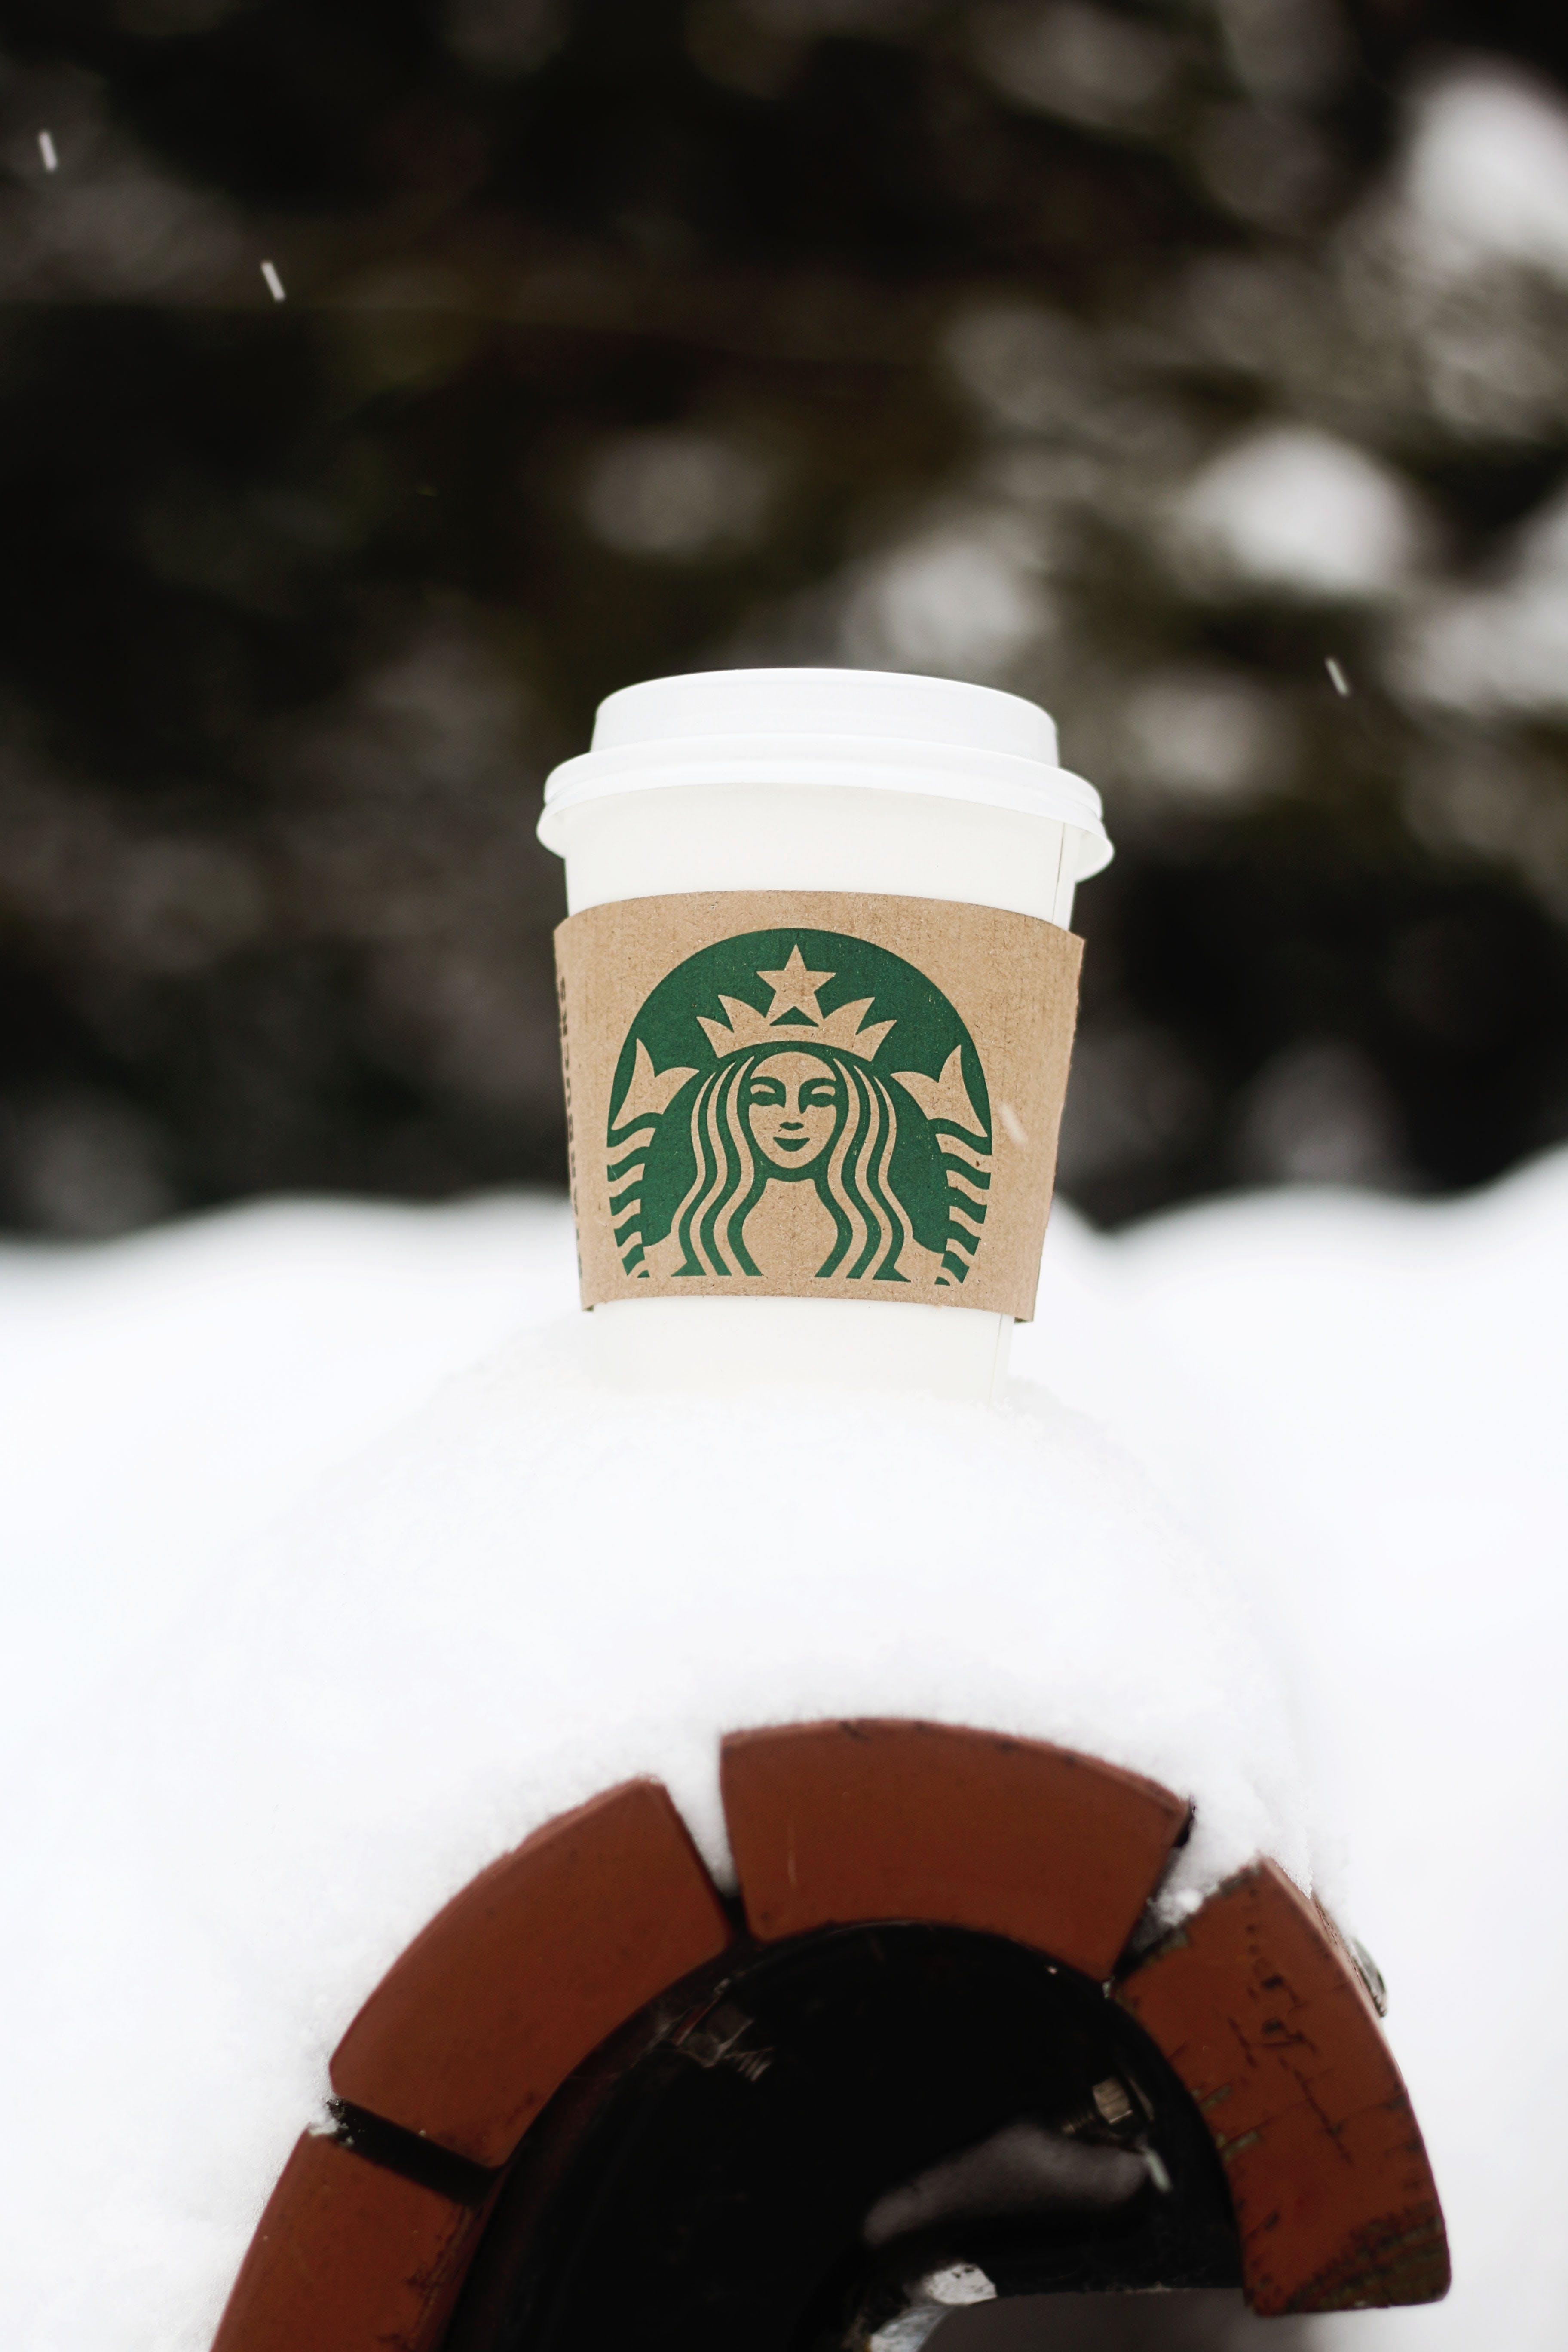 Starbucks Hot Coffee Cup